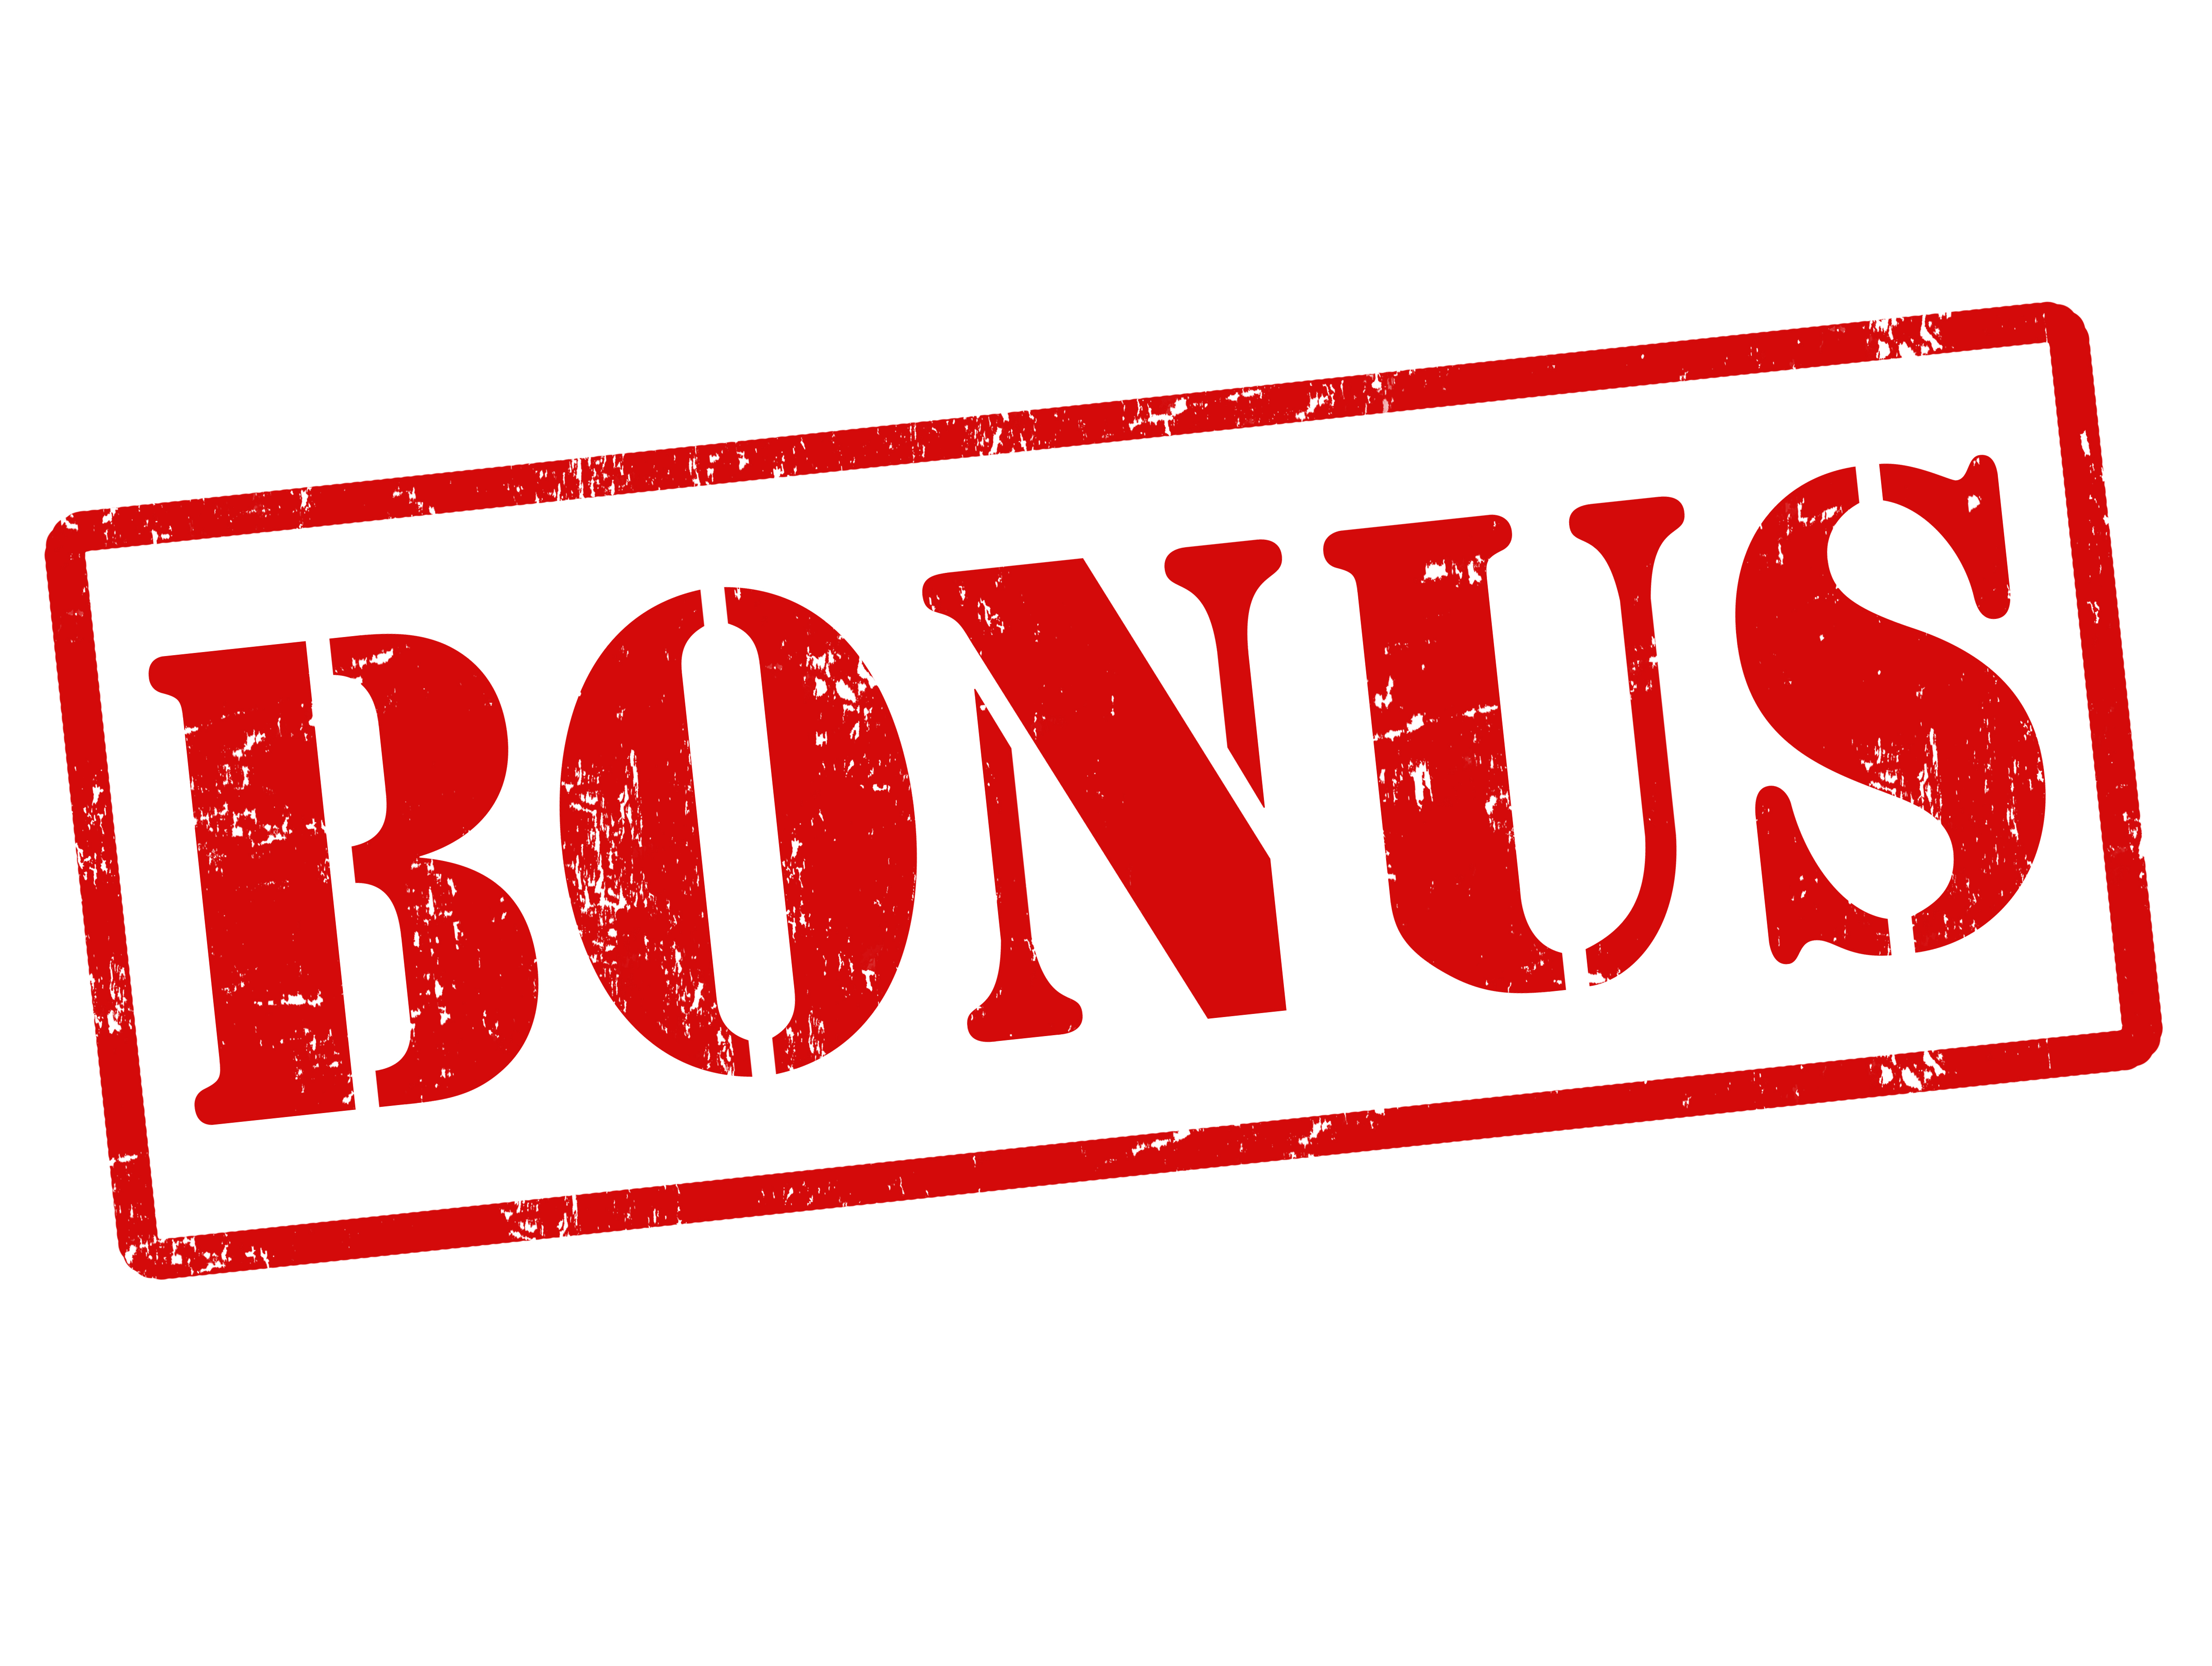 Bonus mobili per giovani coppie studio turnaturi for Bonus mobili giovani coppie